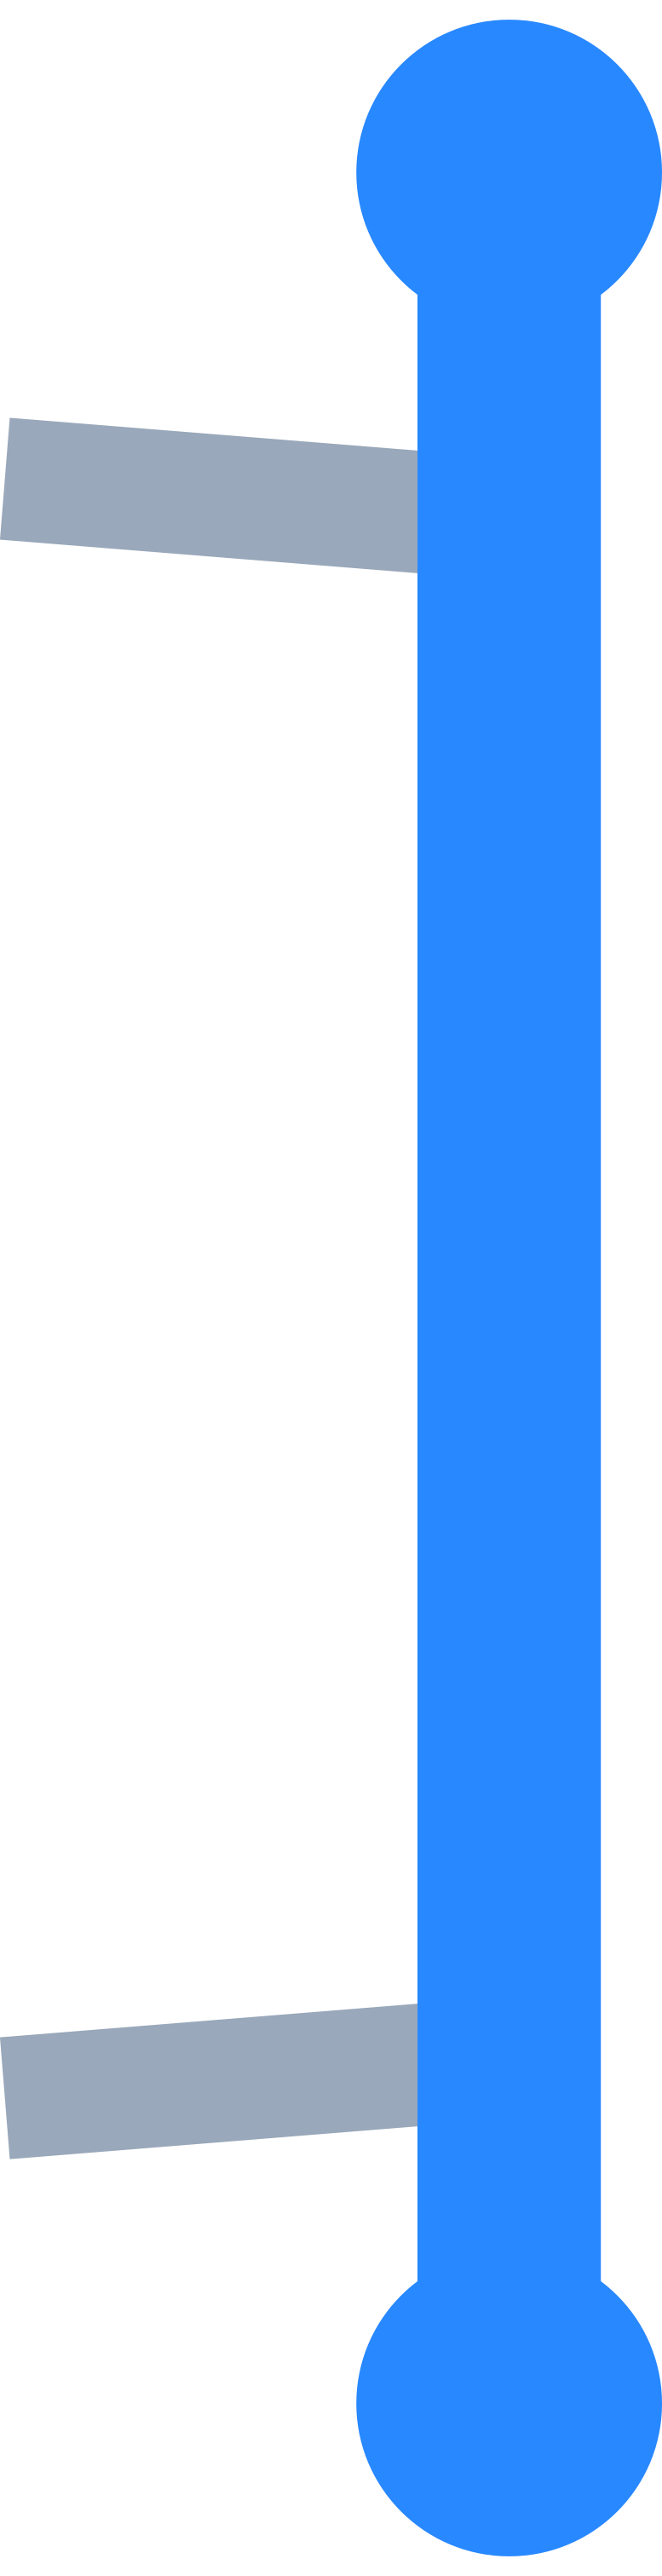 door handle Clipart illustration in PNG, SVG